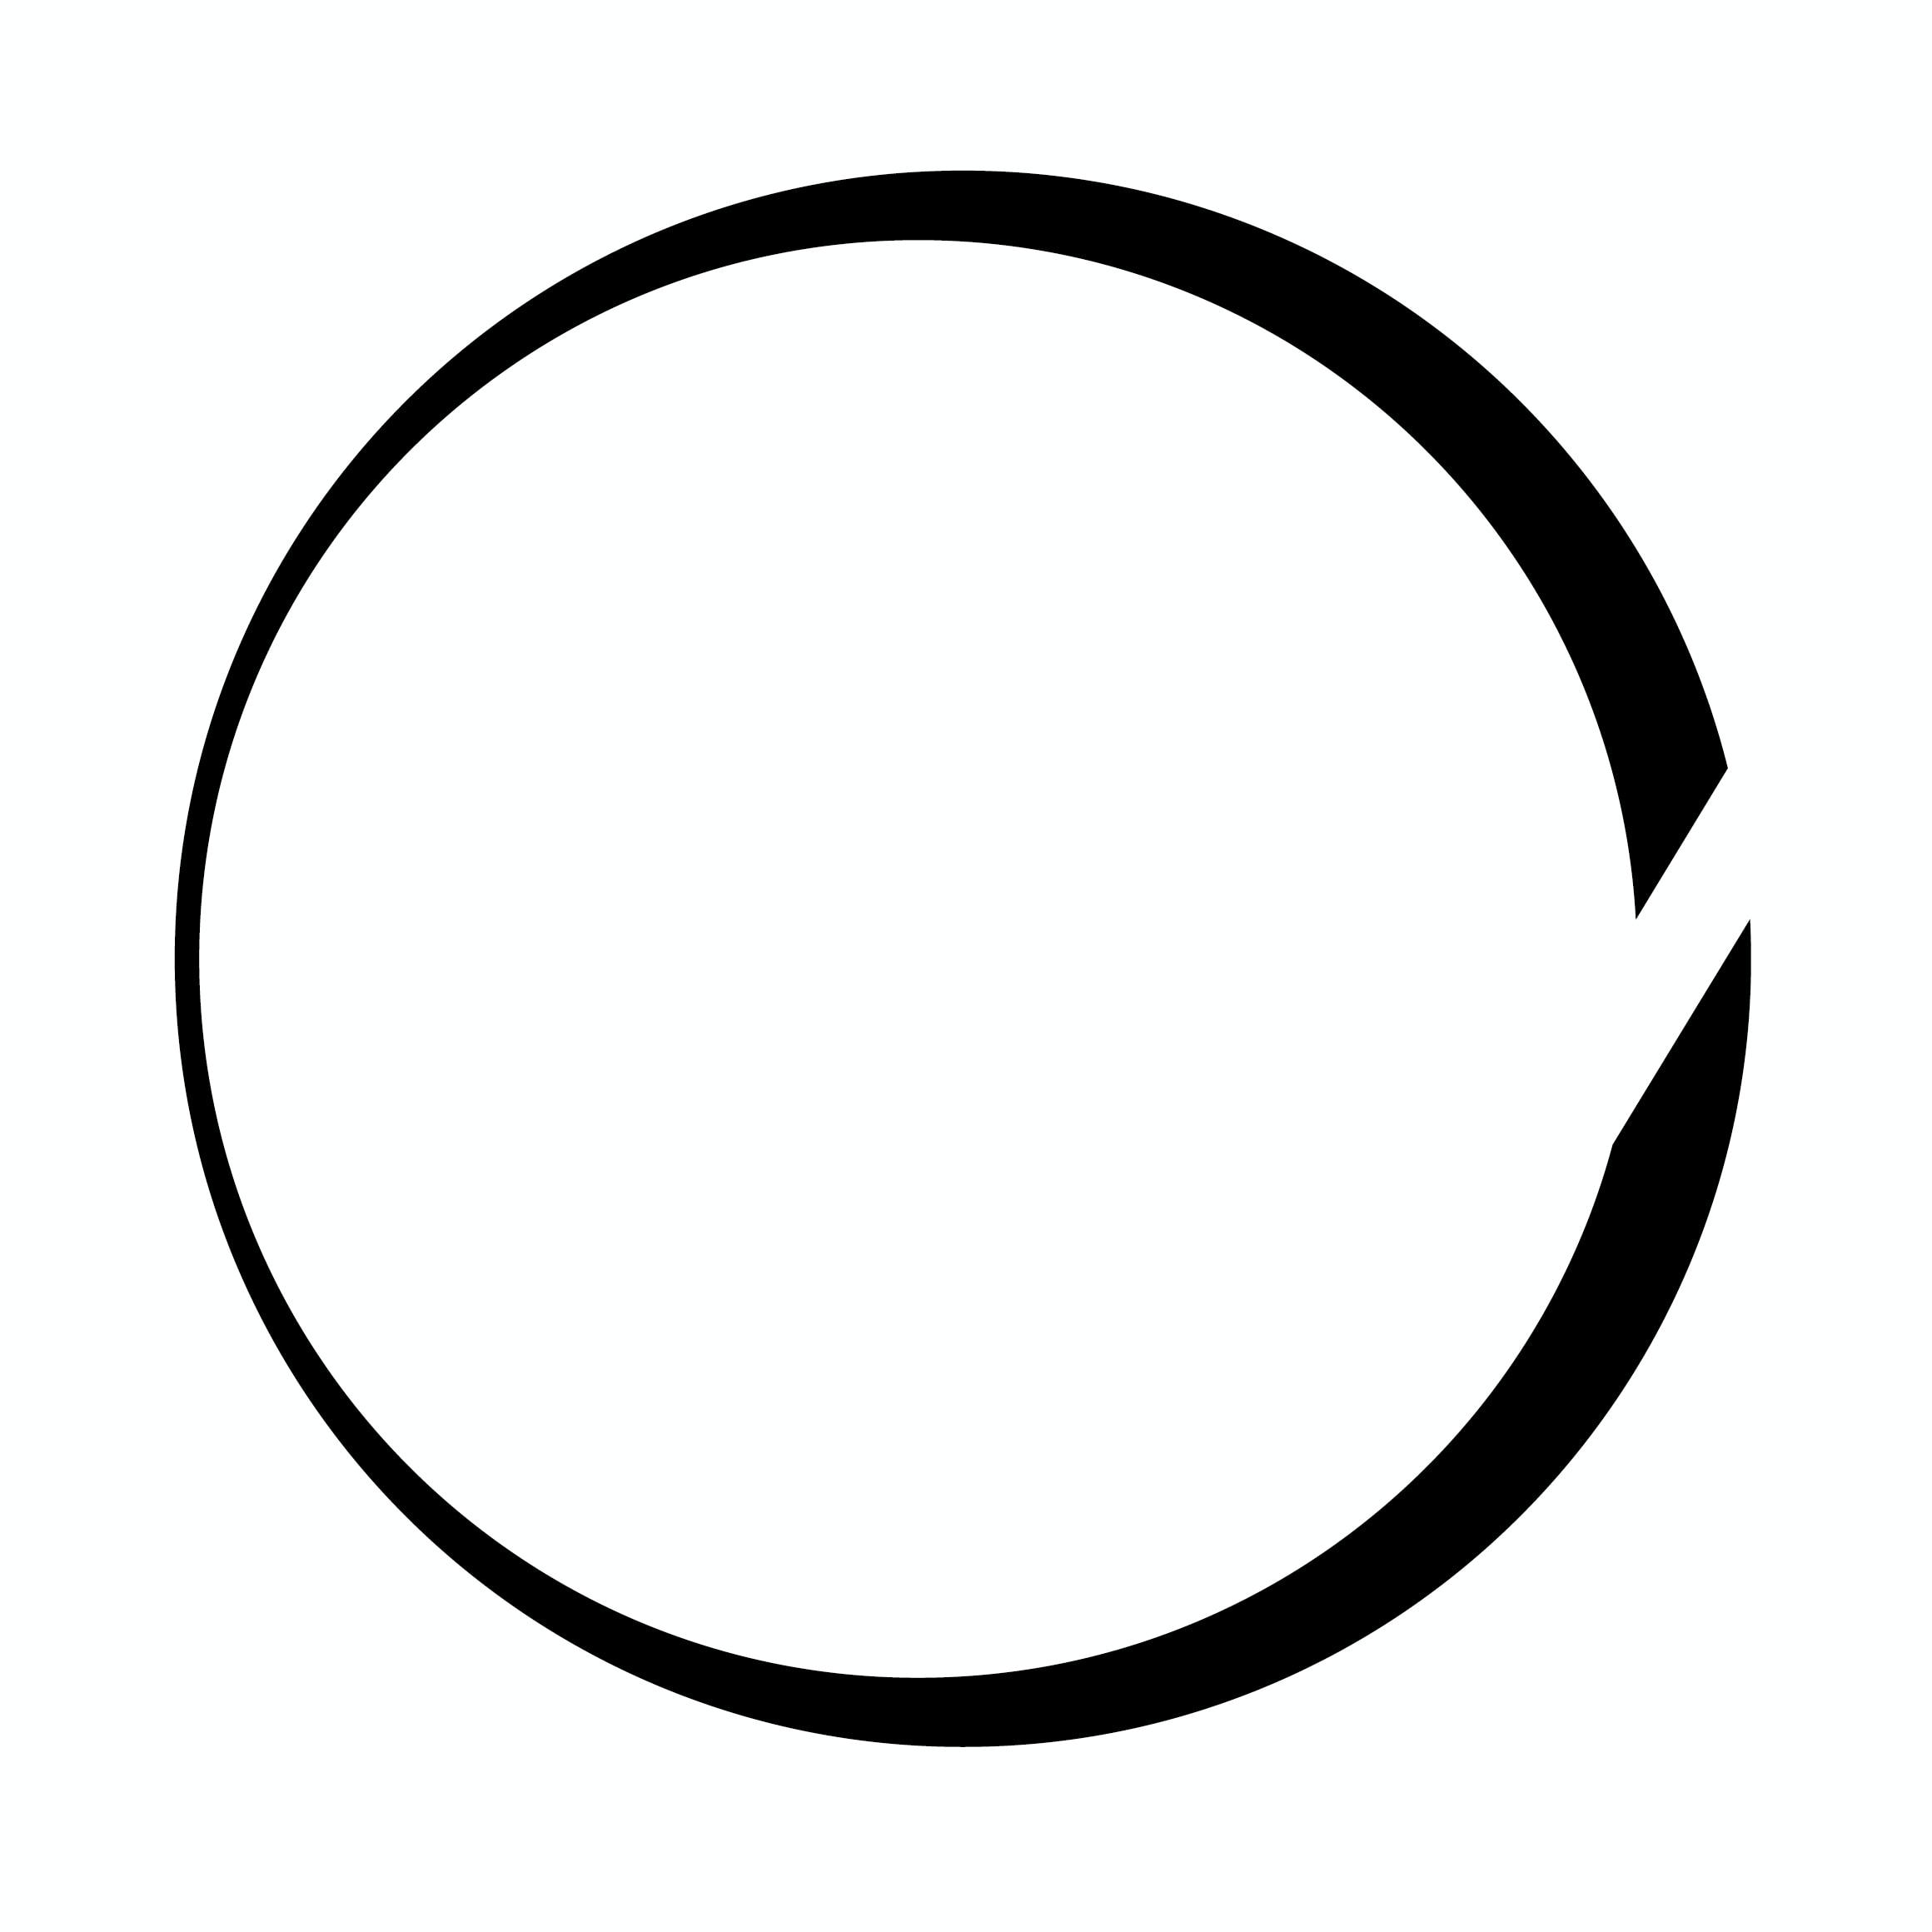 Go to Minimalism Life's profile